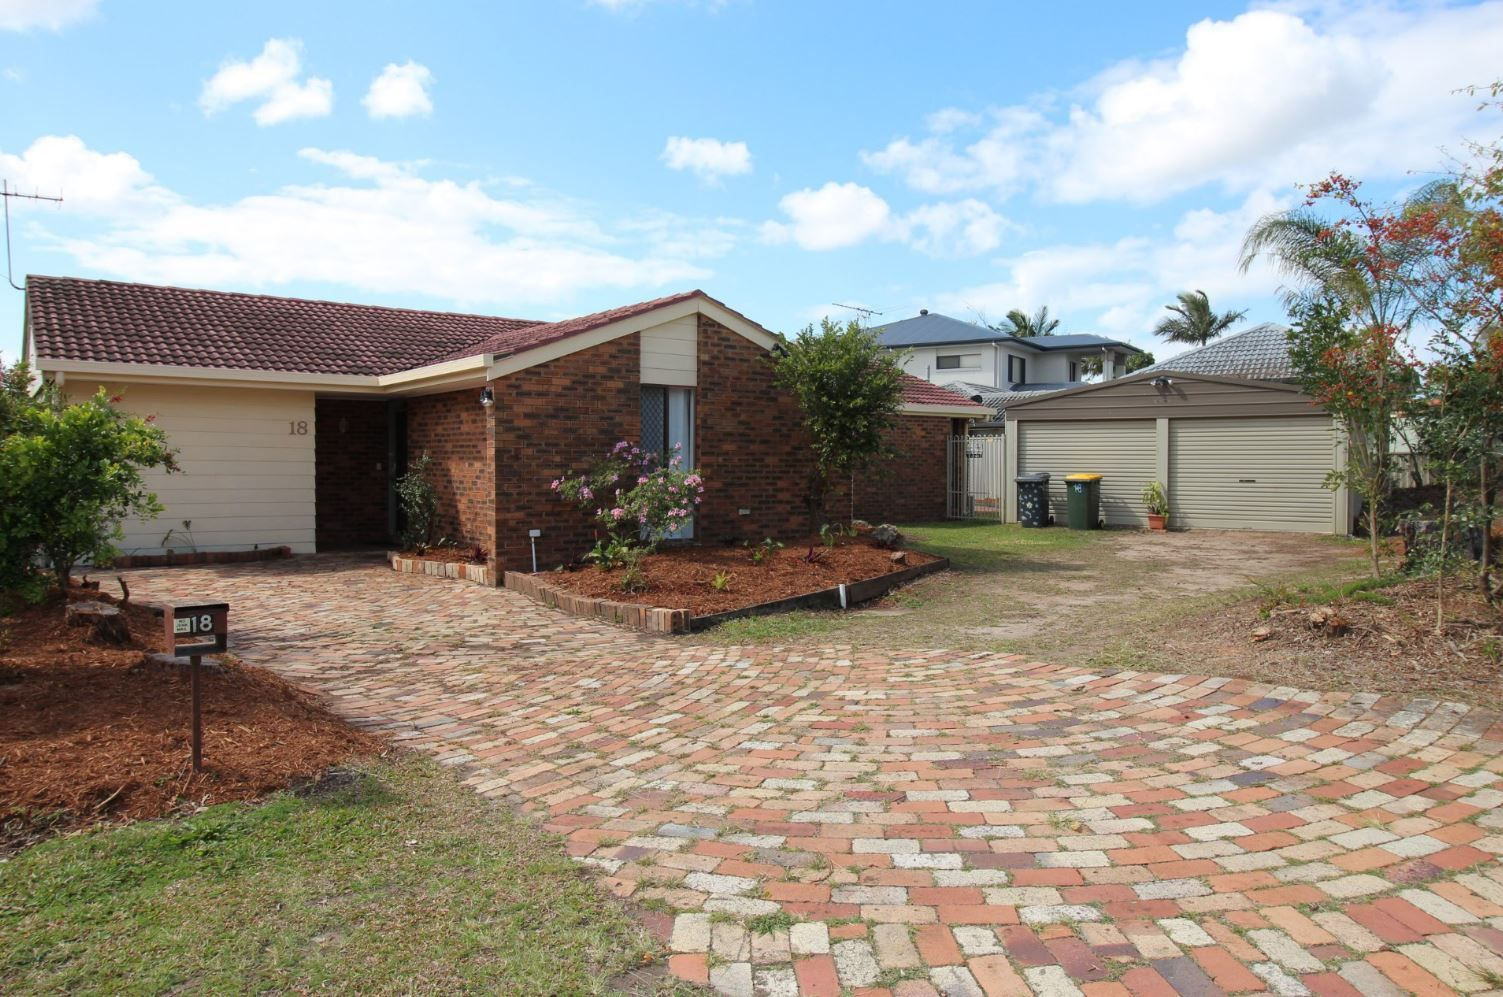 18 Bodian Street, Carindale QLD 4152, Image 0